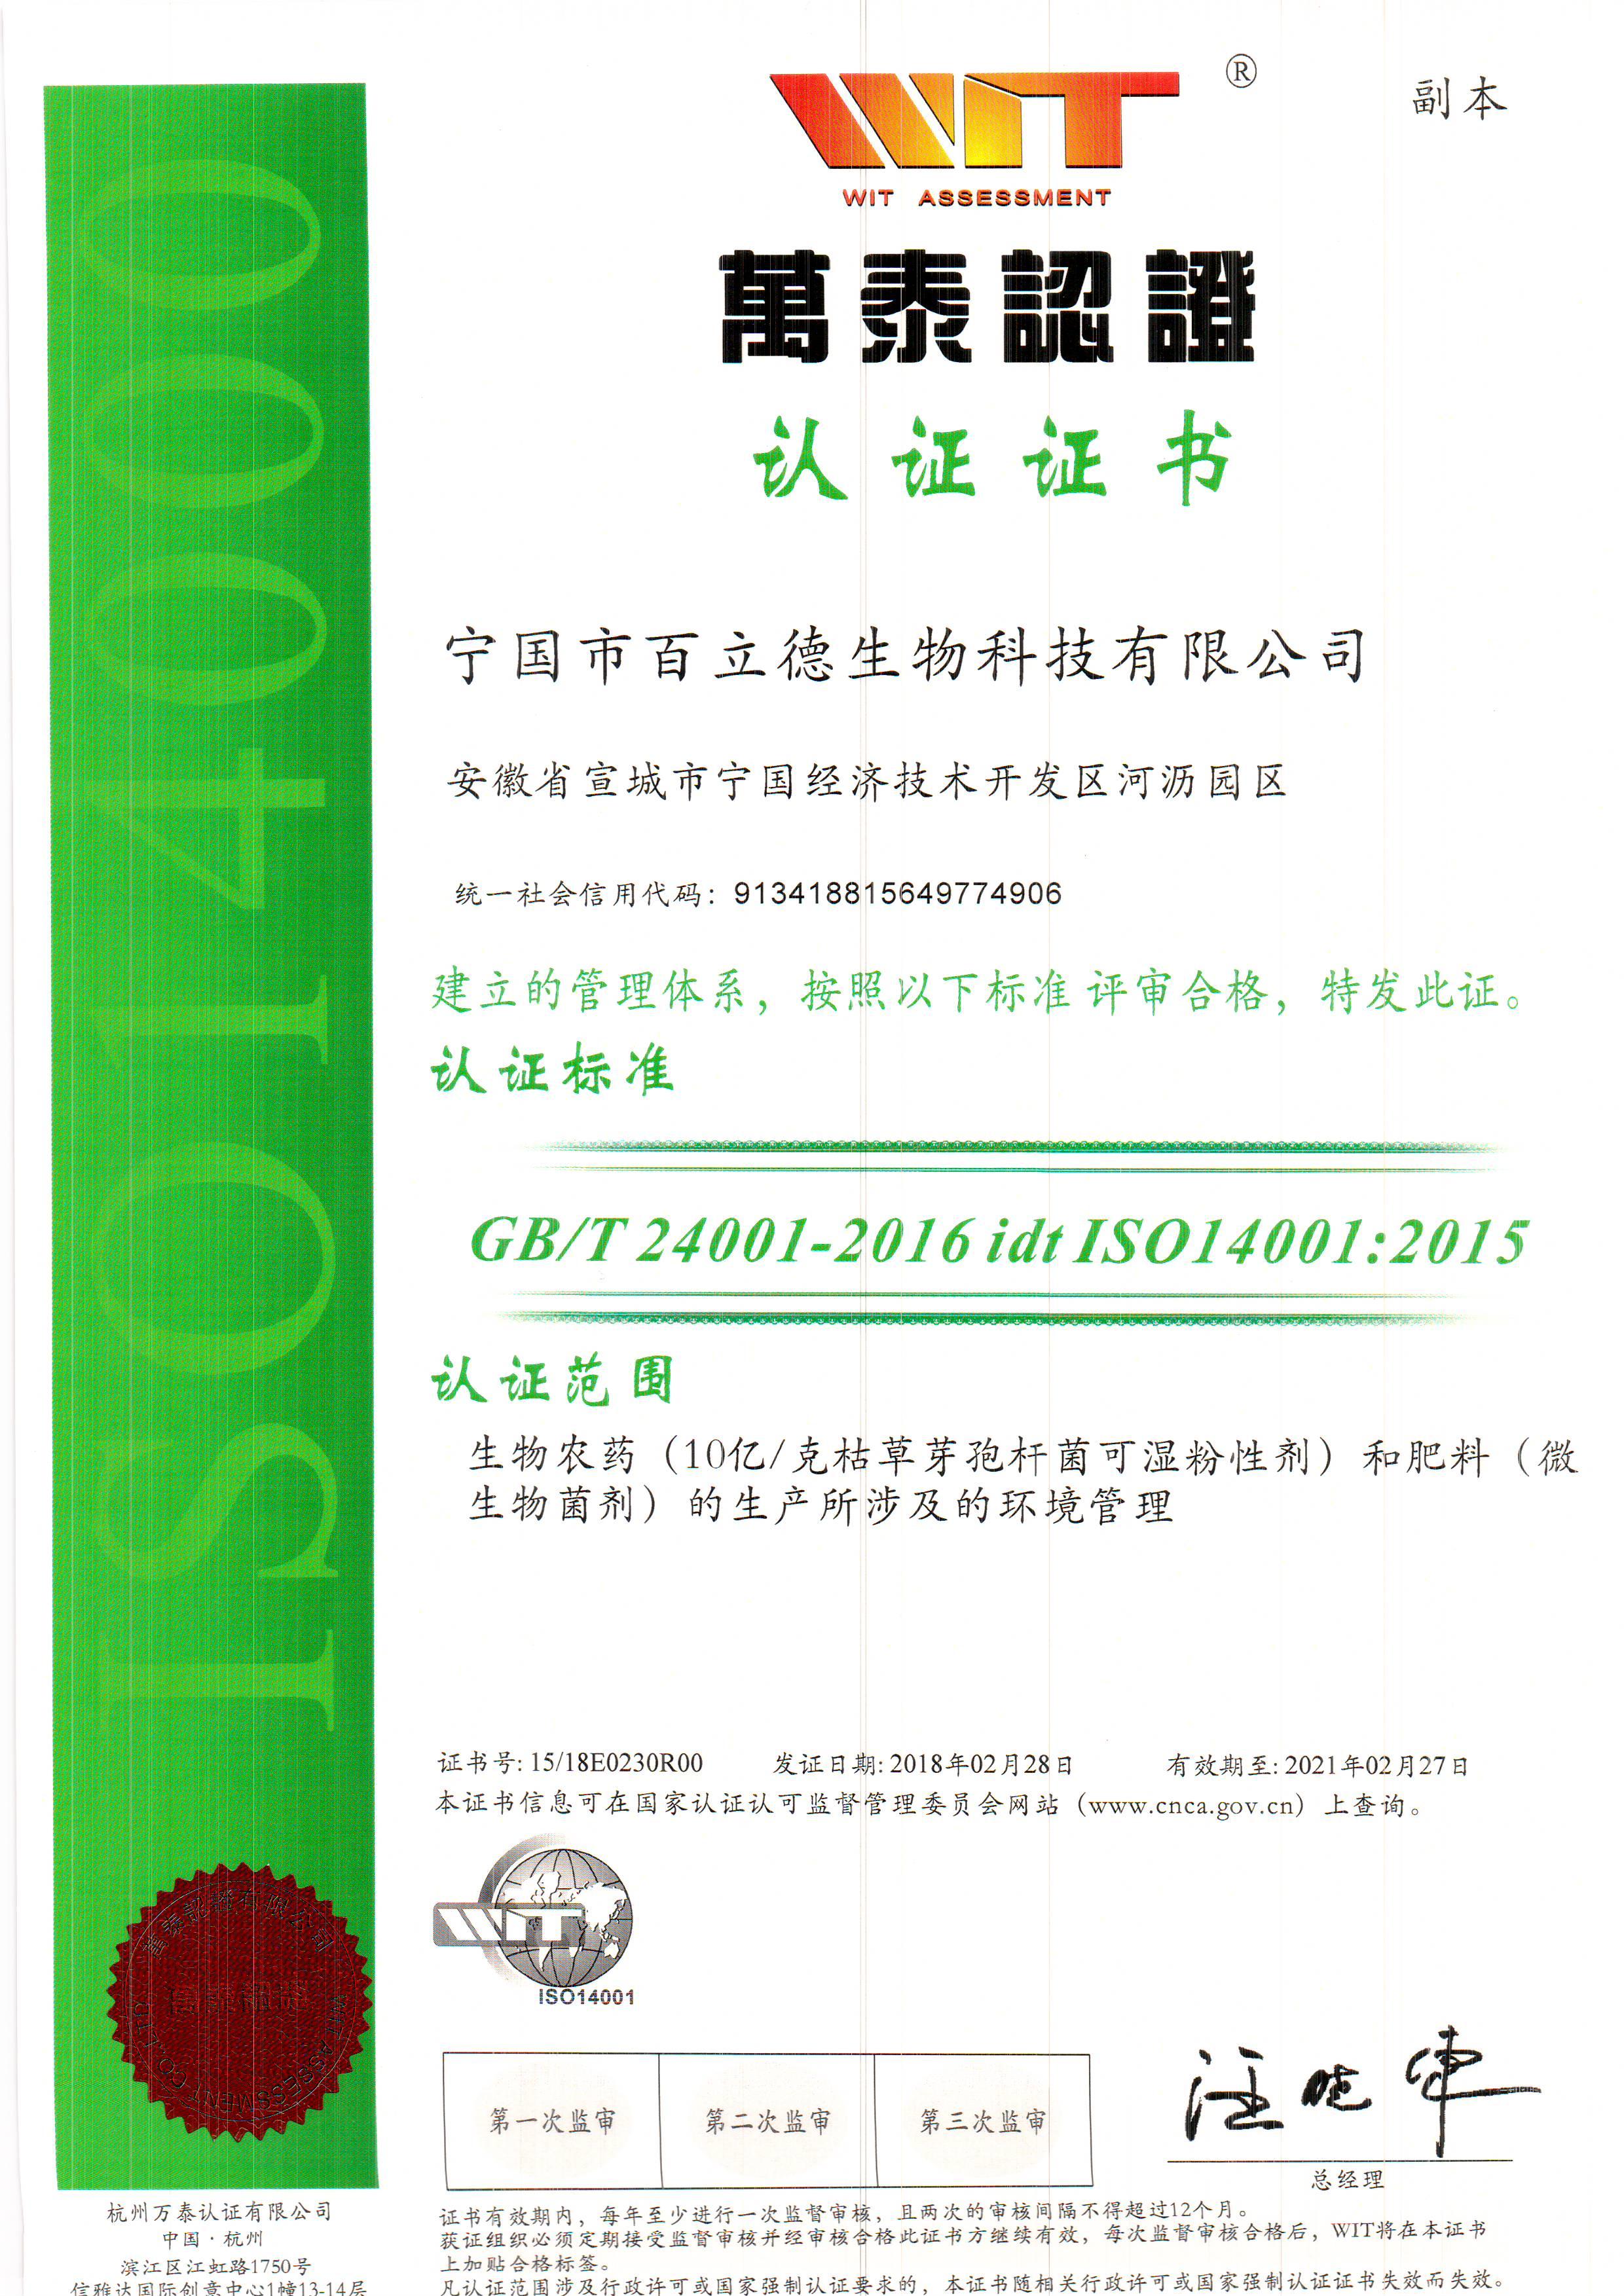 20180228副本10億枯草和肥料ISO14001;2015